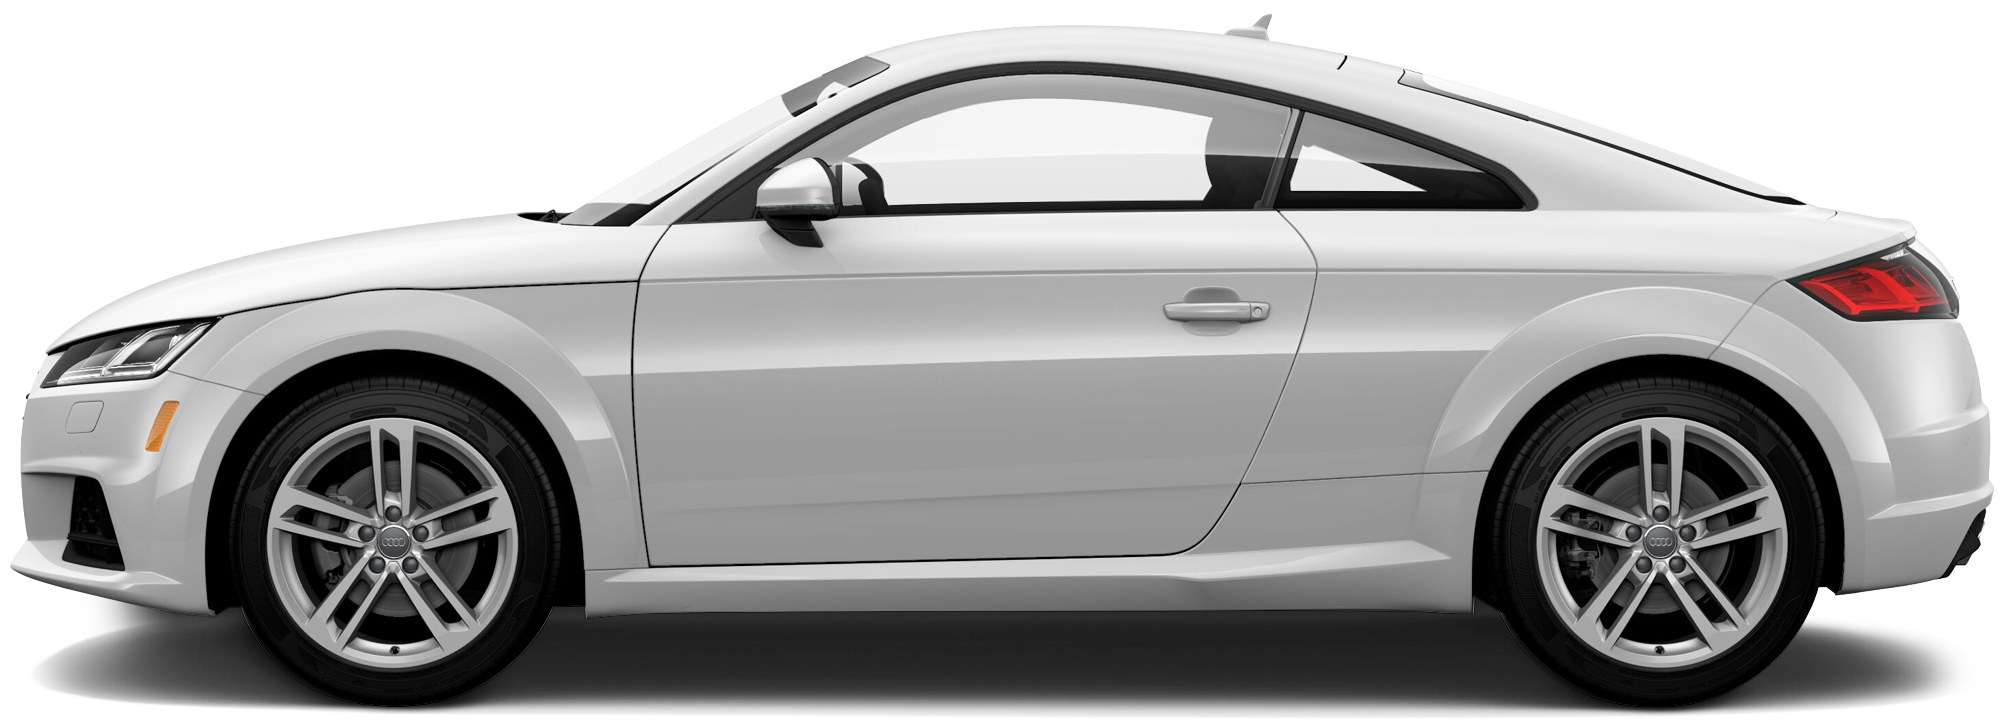 2020 Audi TT Coupe 2.0T